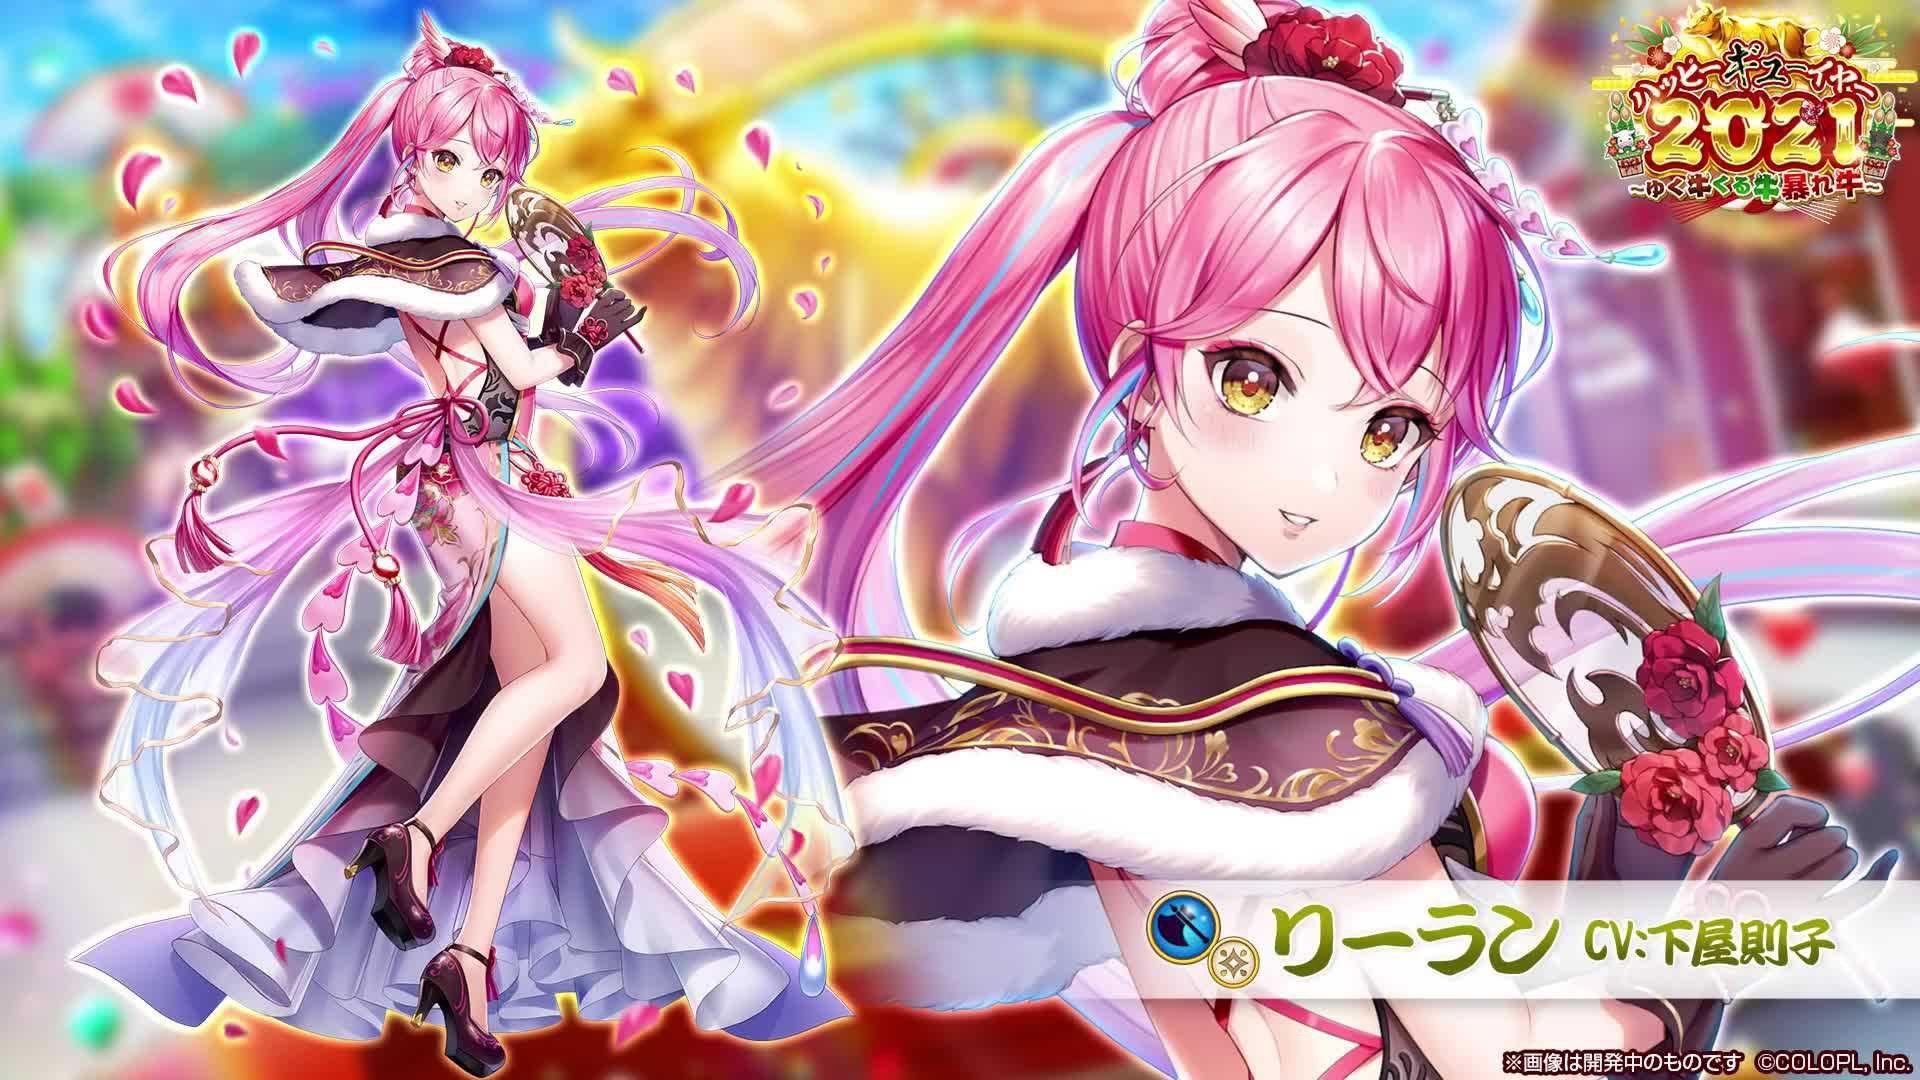 Riran Shironeko Project New Year 2021 Happy Gyu Year 2021 Wallpaper Hd Hq Darkneel Buster Anime new year wallpaper 2021